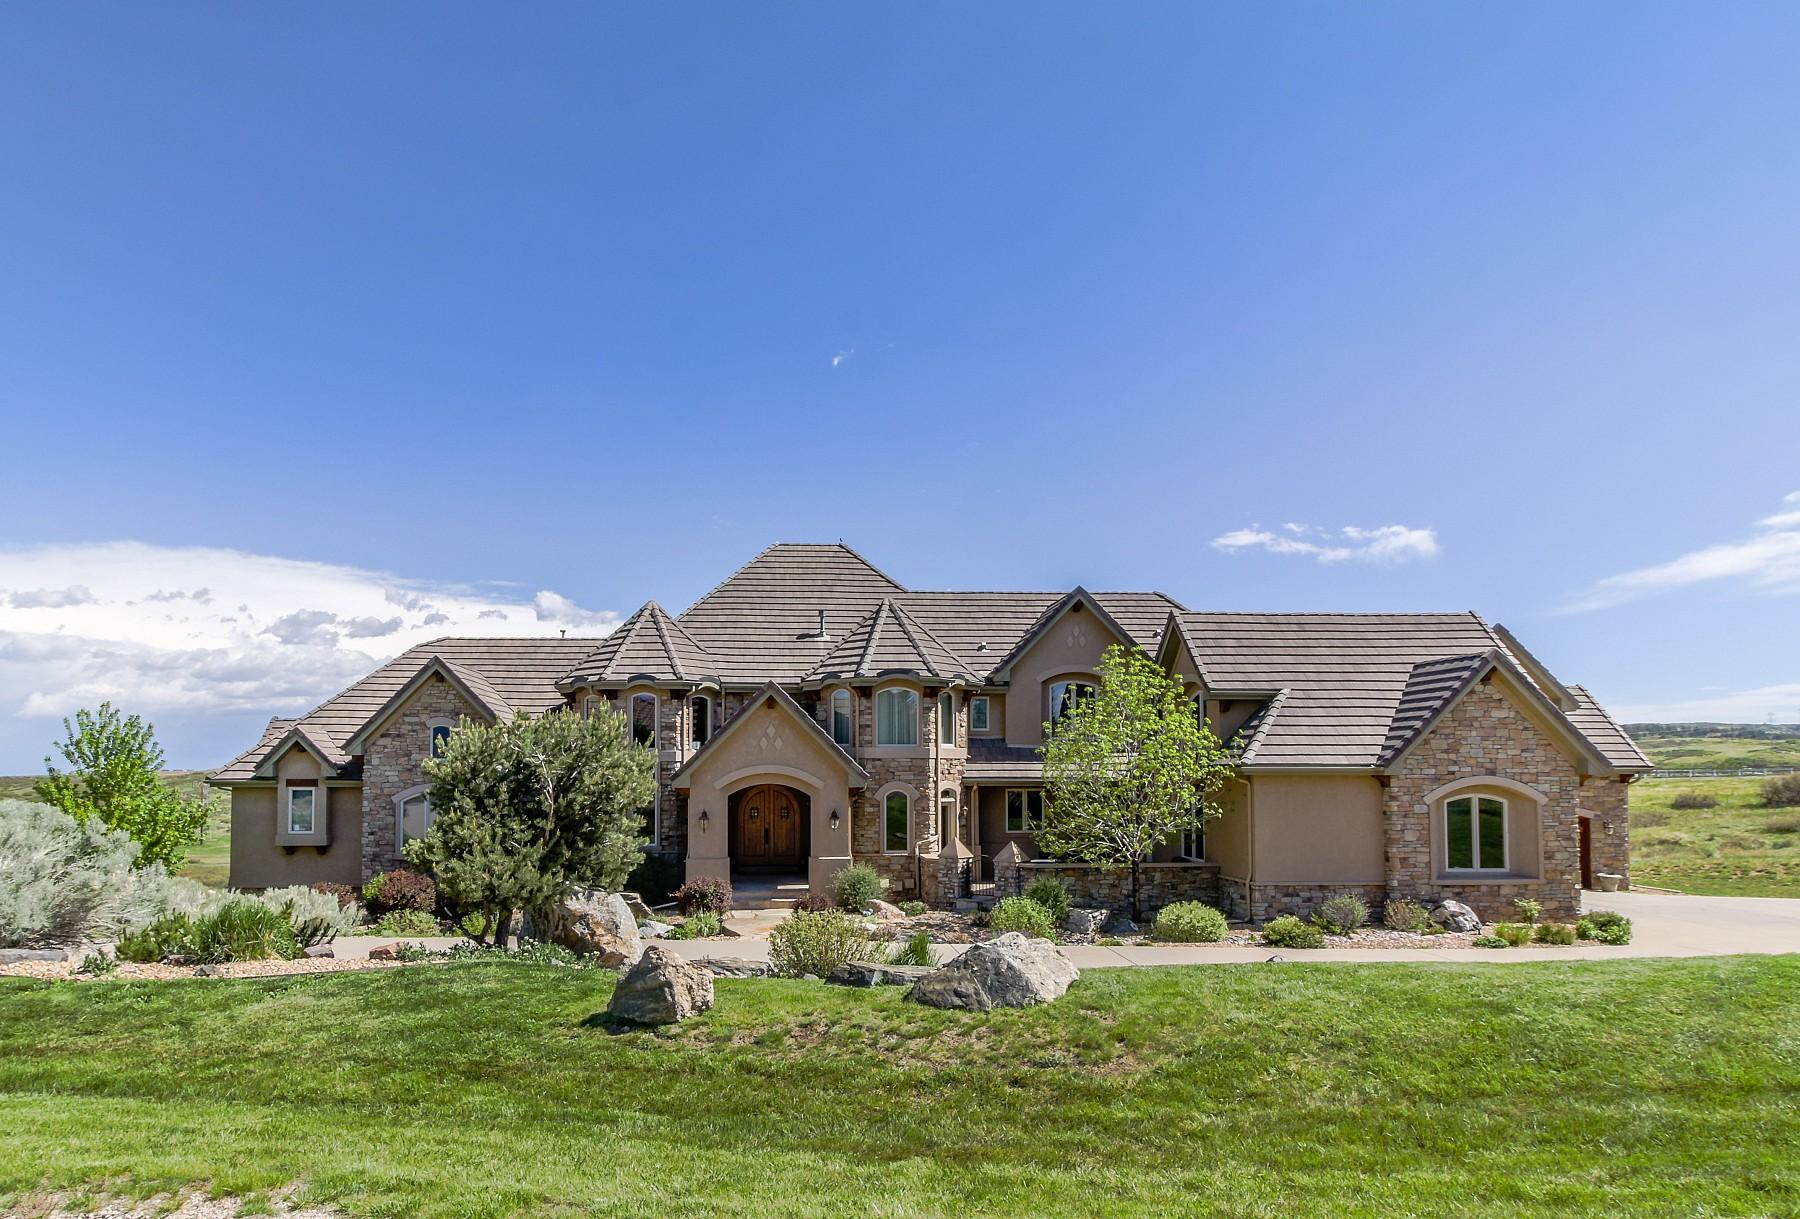 5660 Aspen Leaf Drive, Littleton, CO 80125